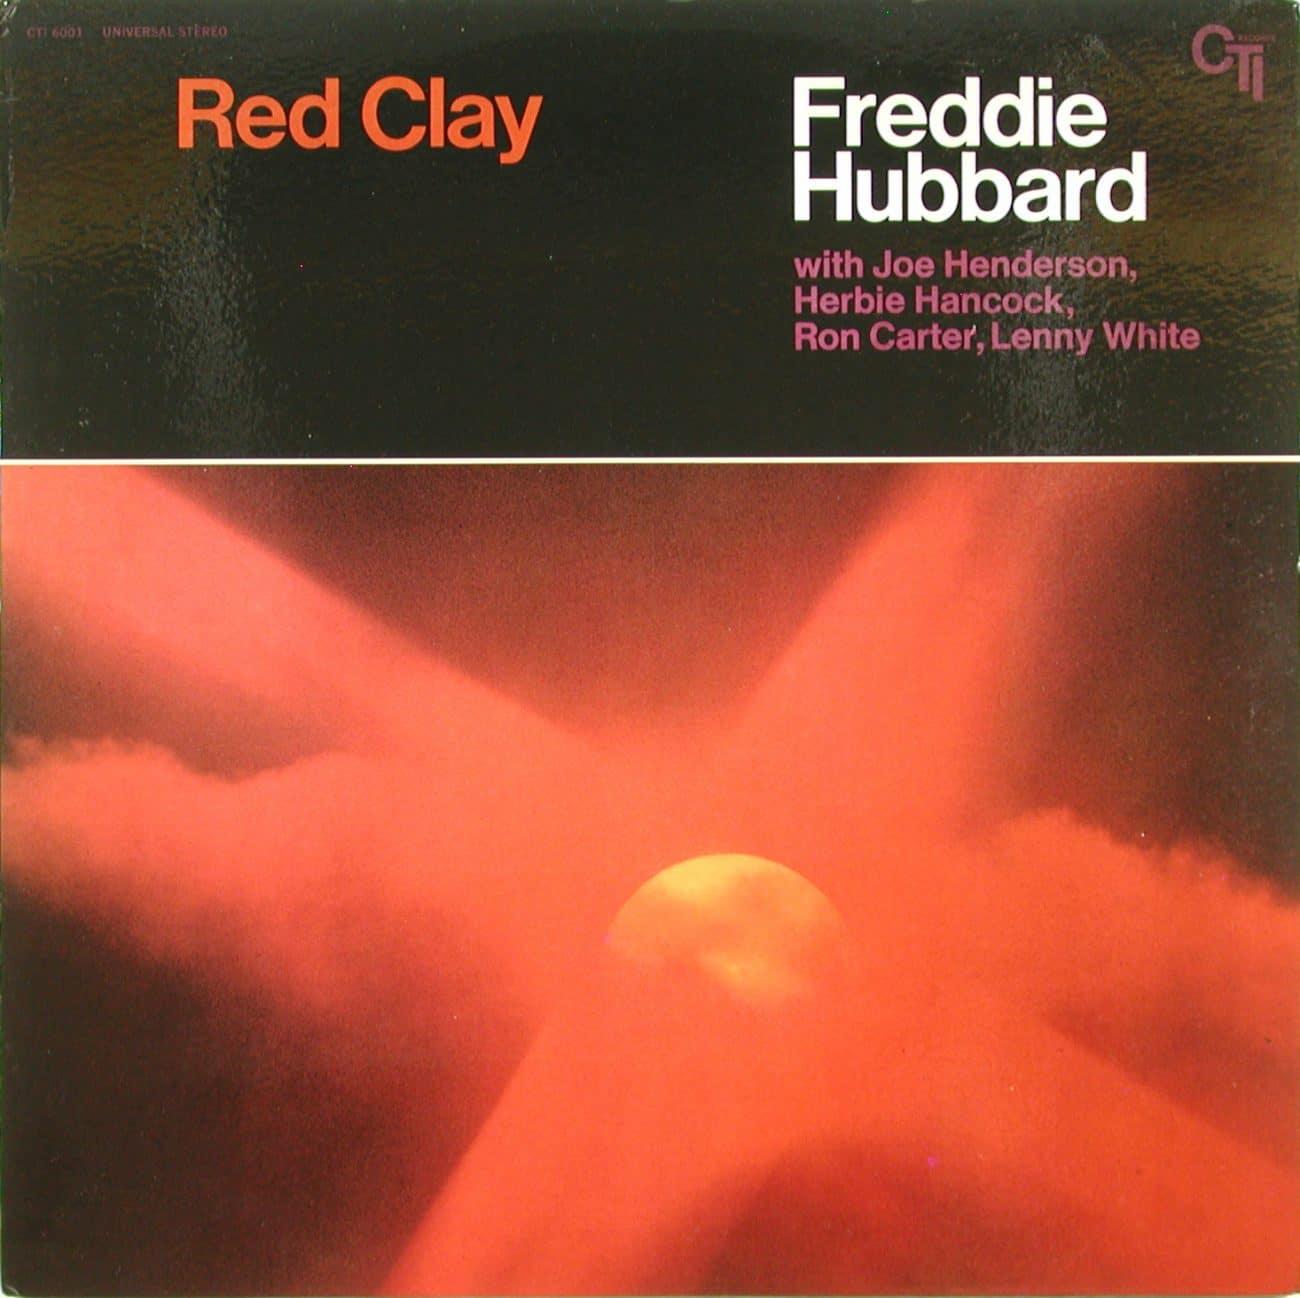 Freddie Hubbard - Red Clay - 1975